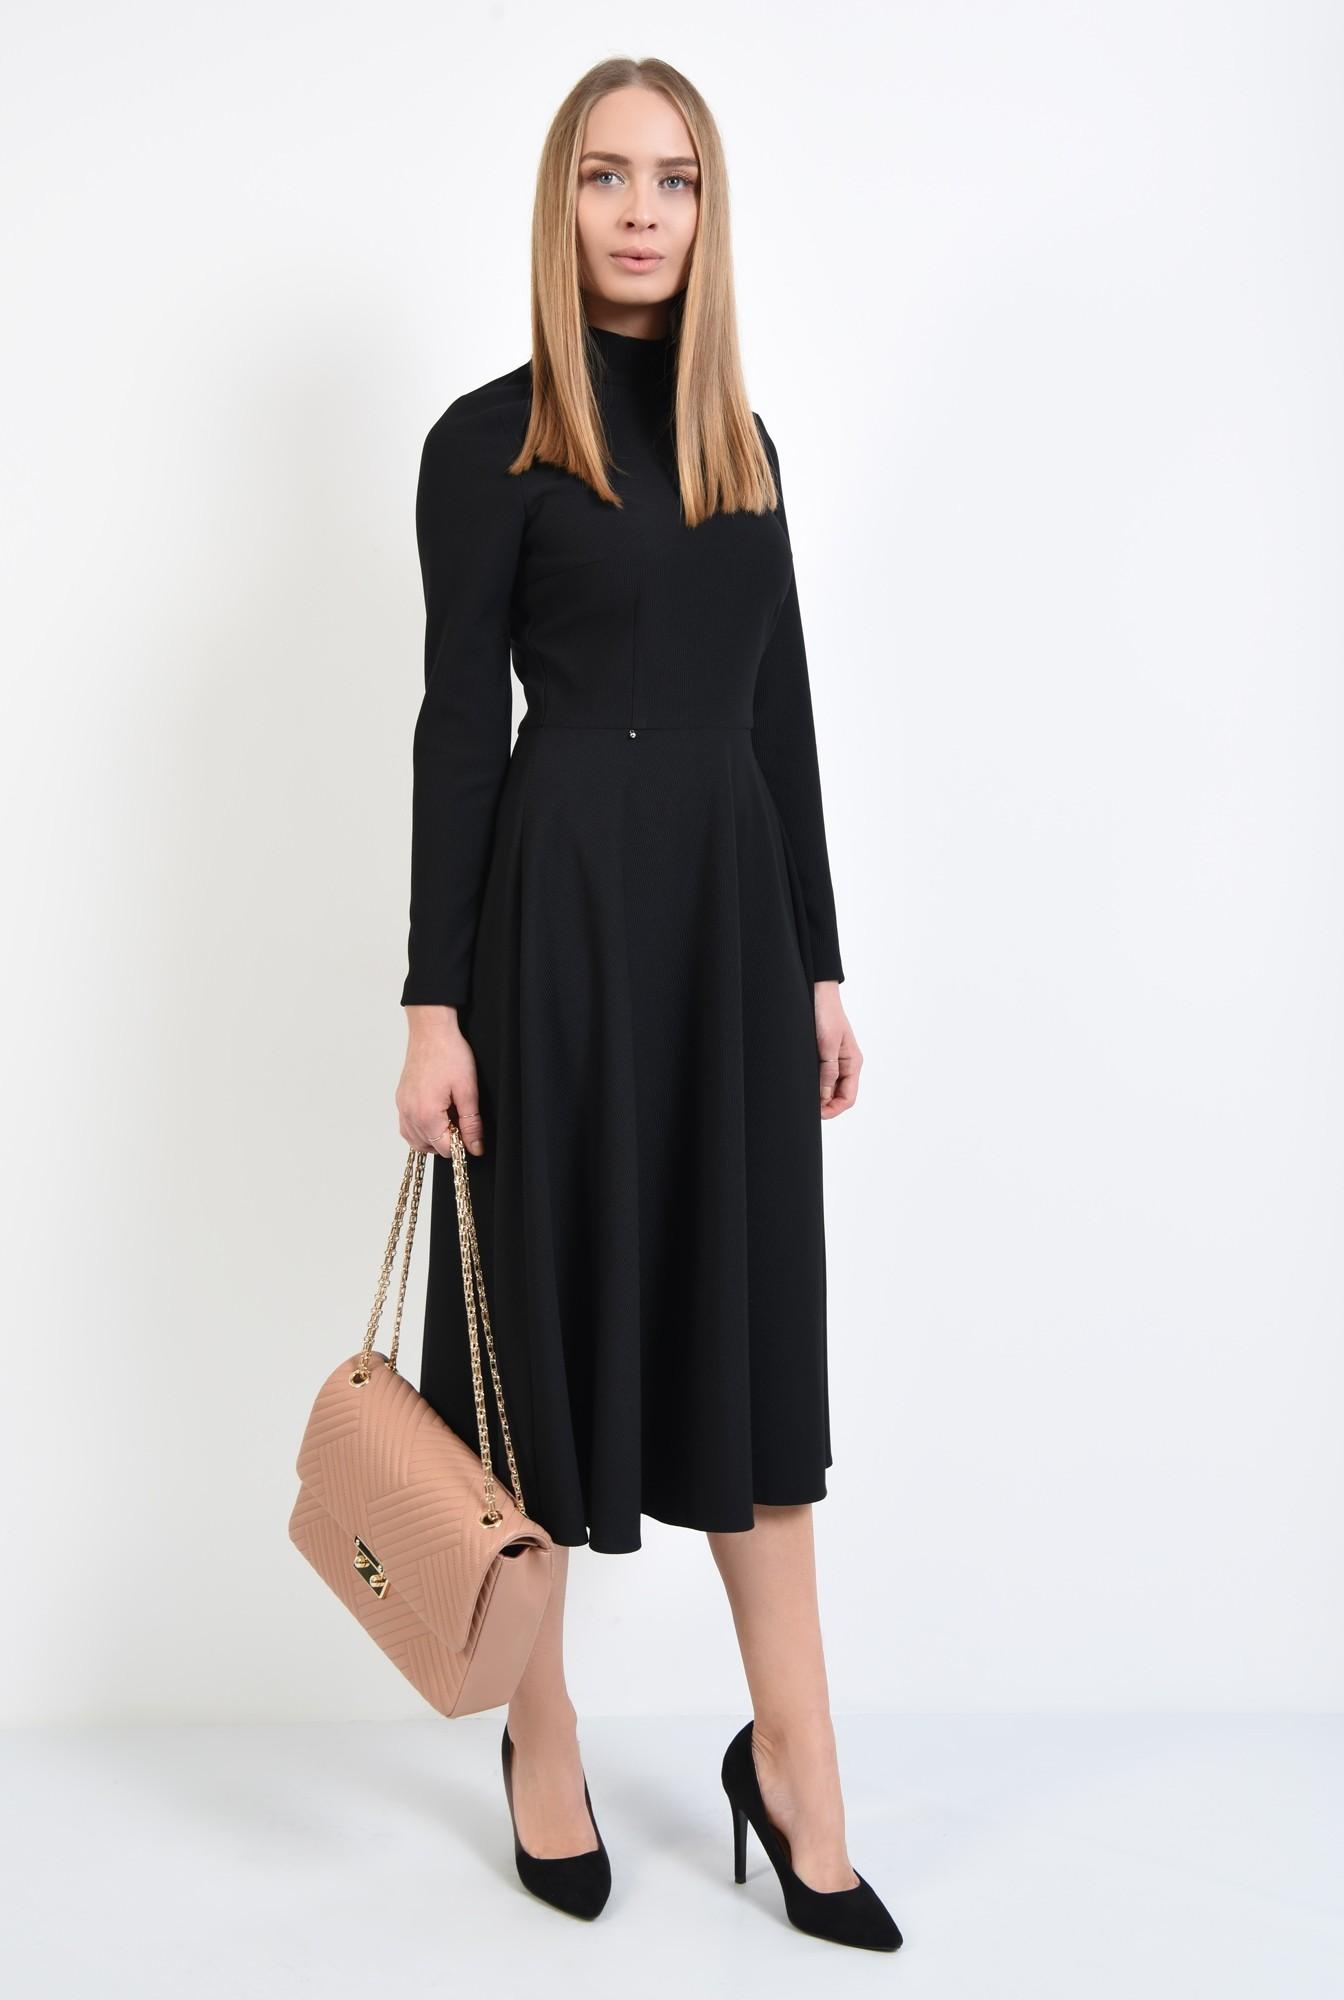 3 - rochie casual, neagra, evazata, nasturi la spate, guler inalt